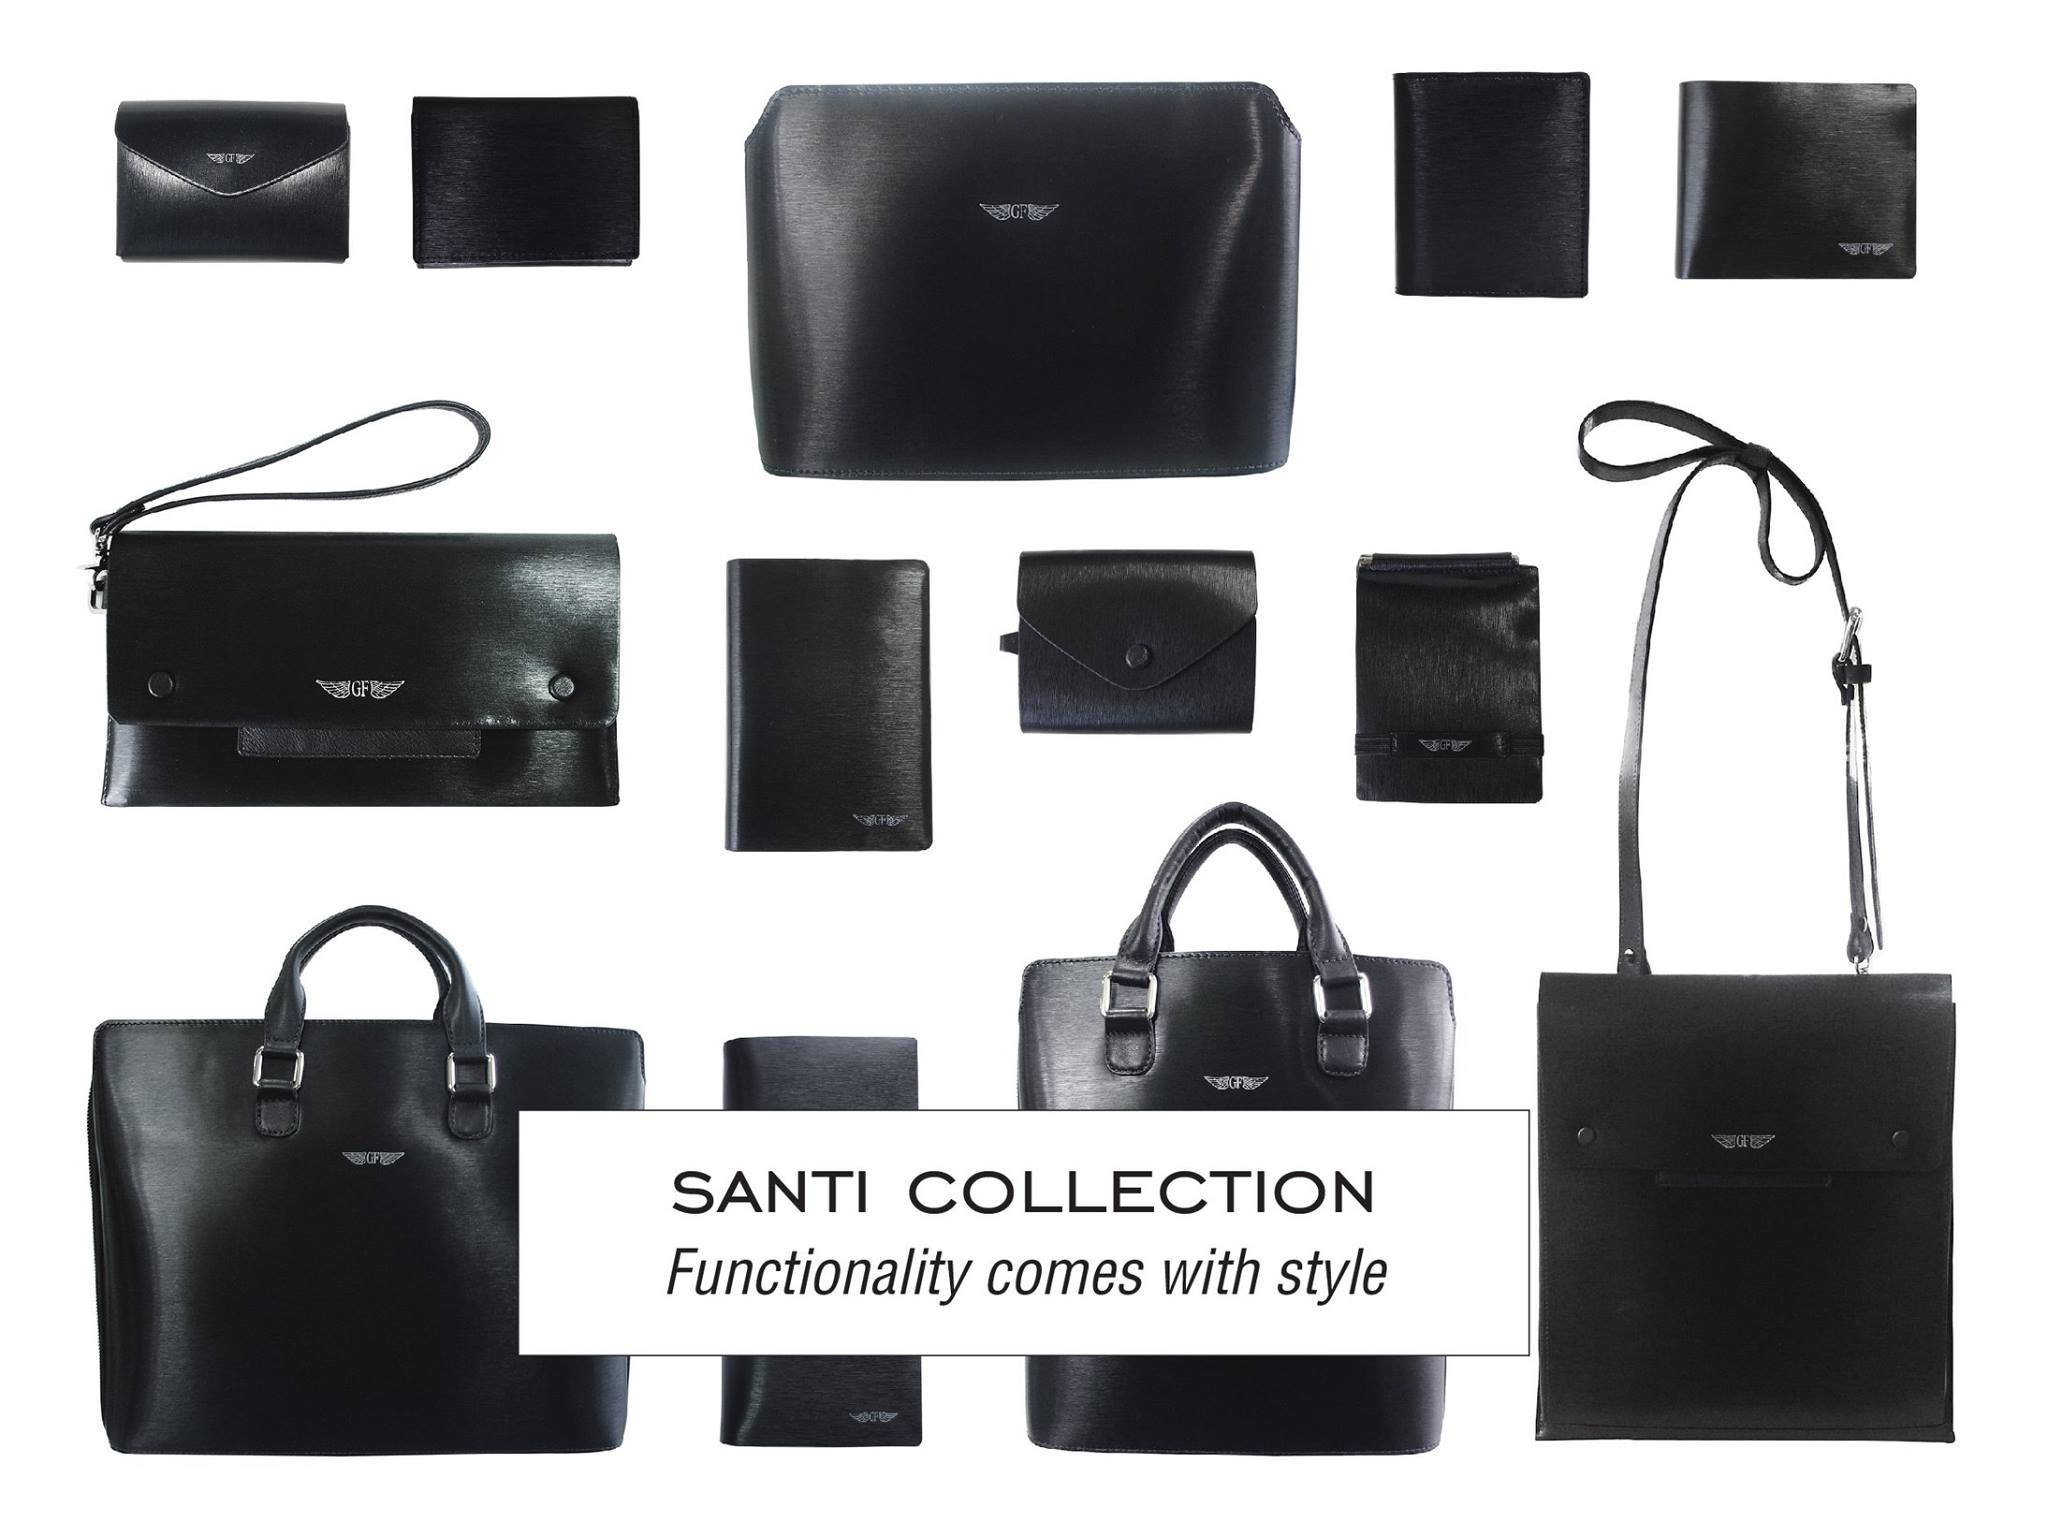 Santiago Collection ความเรียบหรูที่ทันสมัย